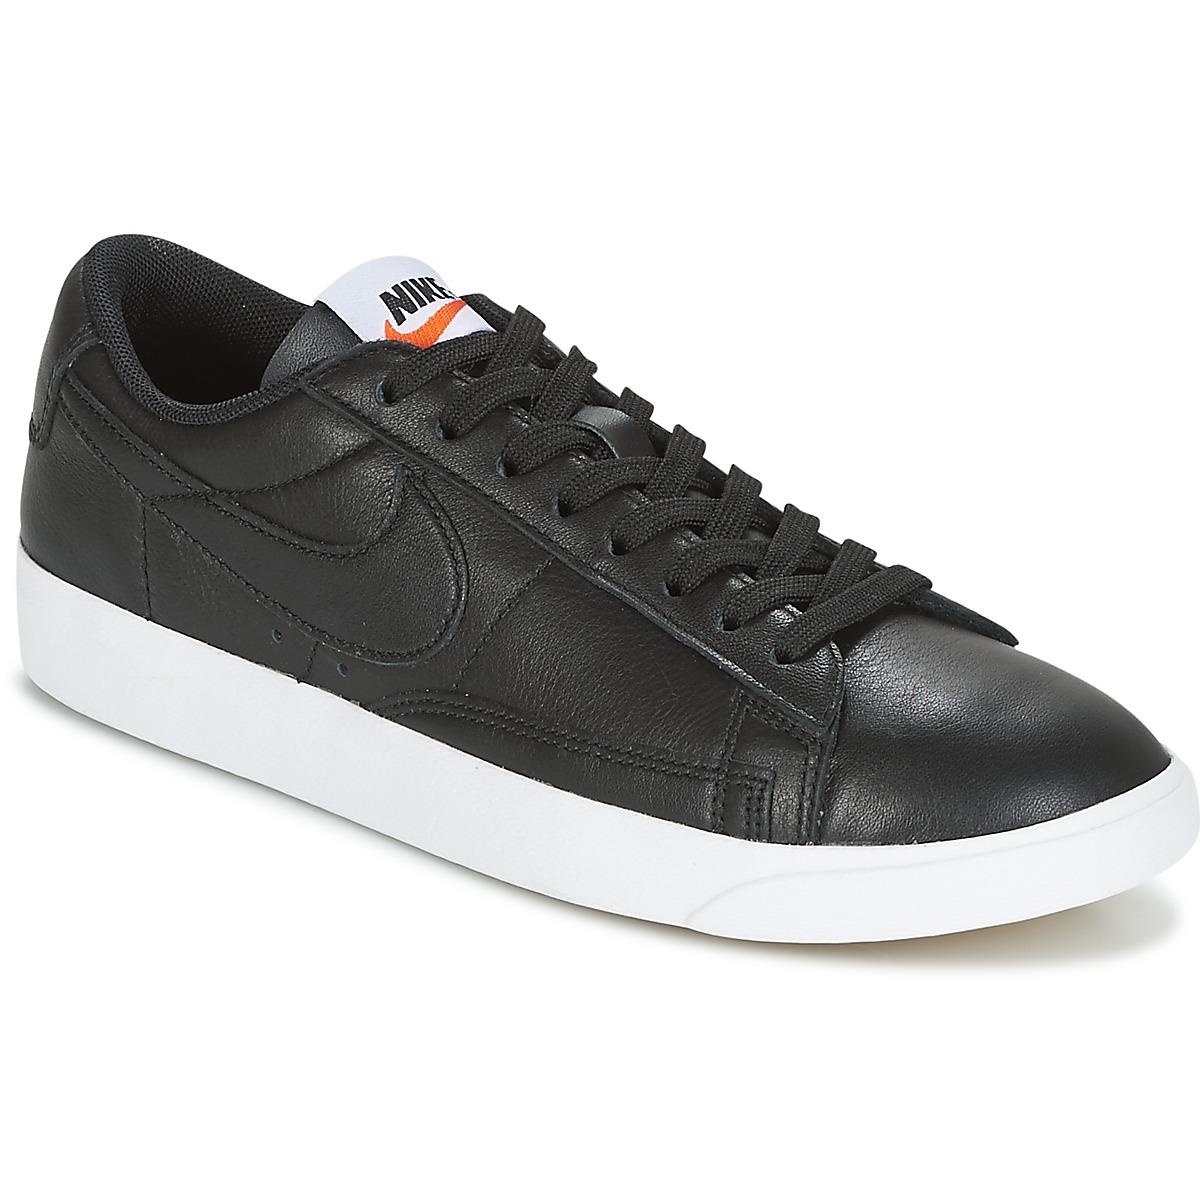 Nike BLAZER LOW LEATHER W Schwarz - Kostenloser Versand bei Spartoode ! - Schuhe Sneaker Low Damen 62,99 €